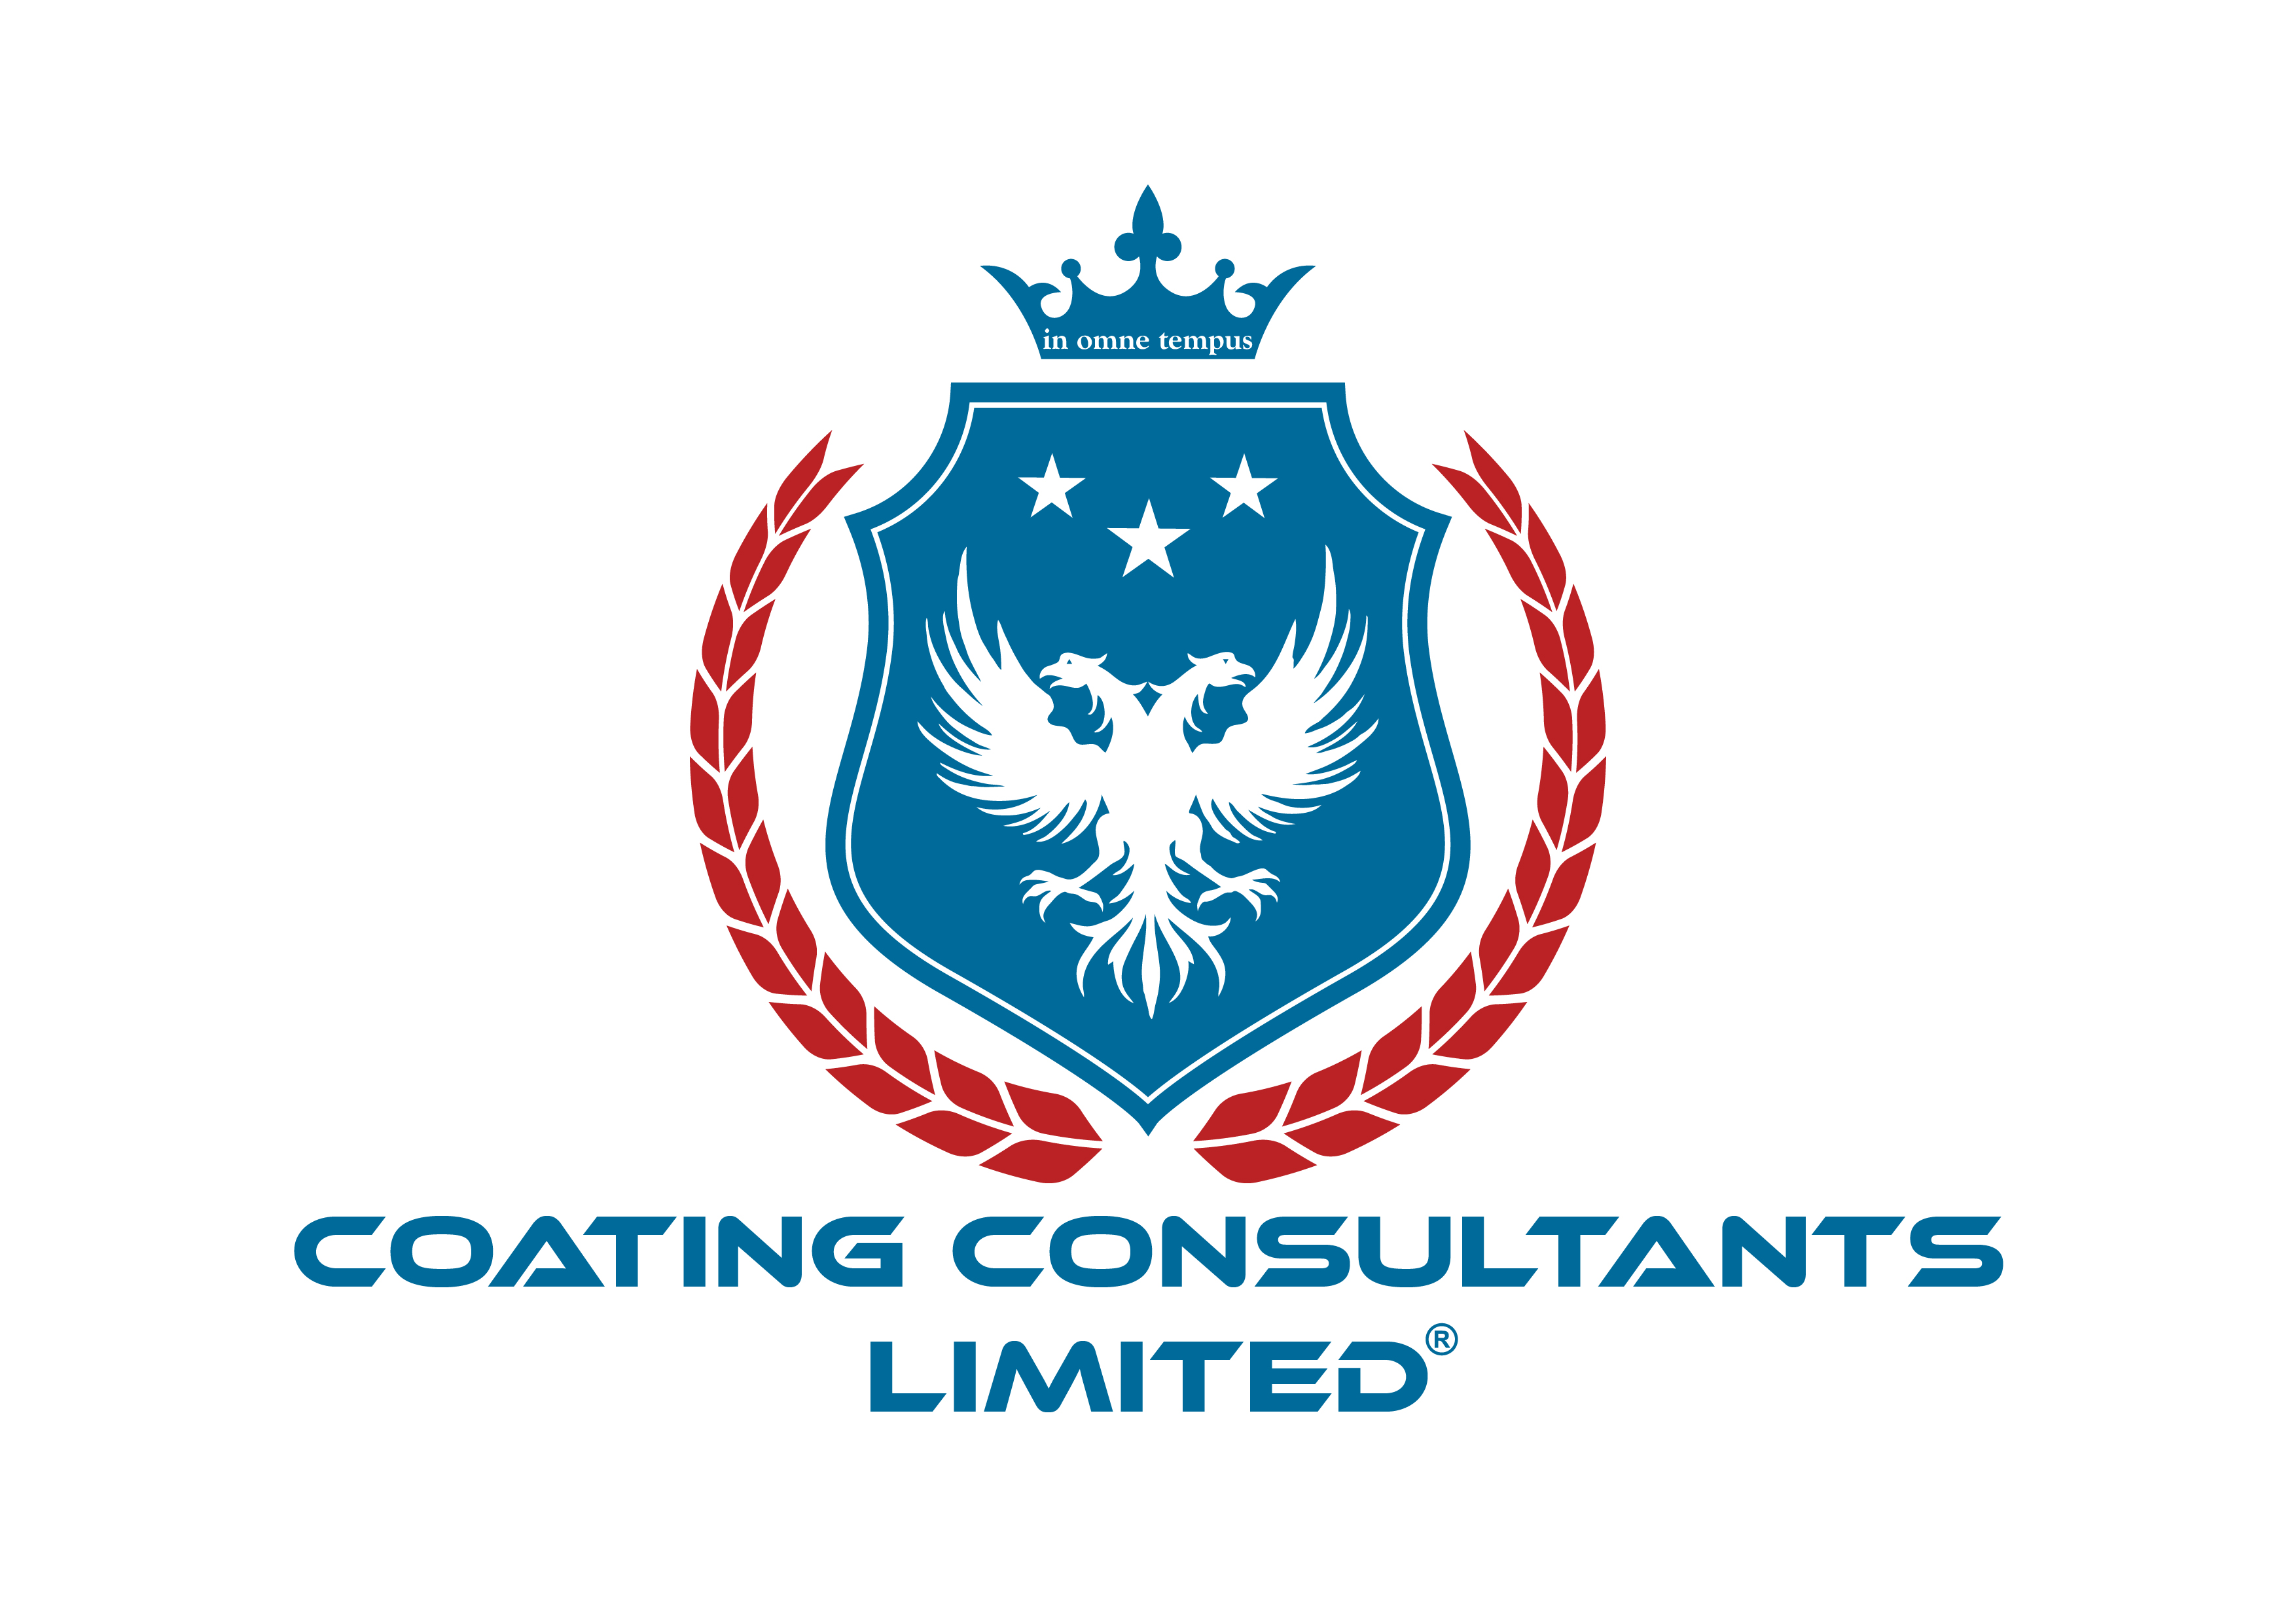 Coating Consultants Ltd